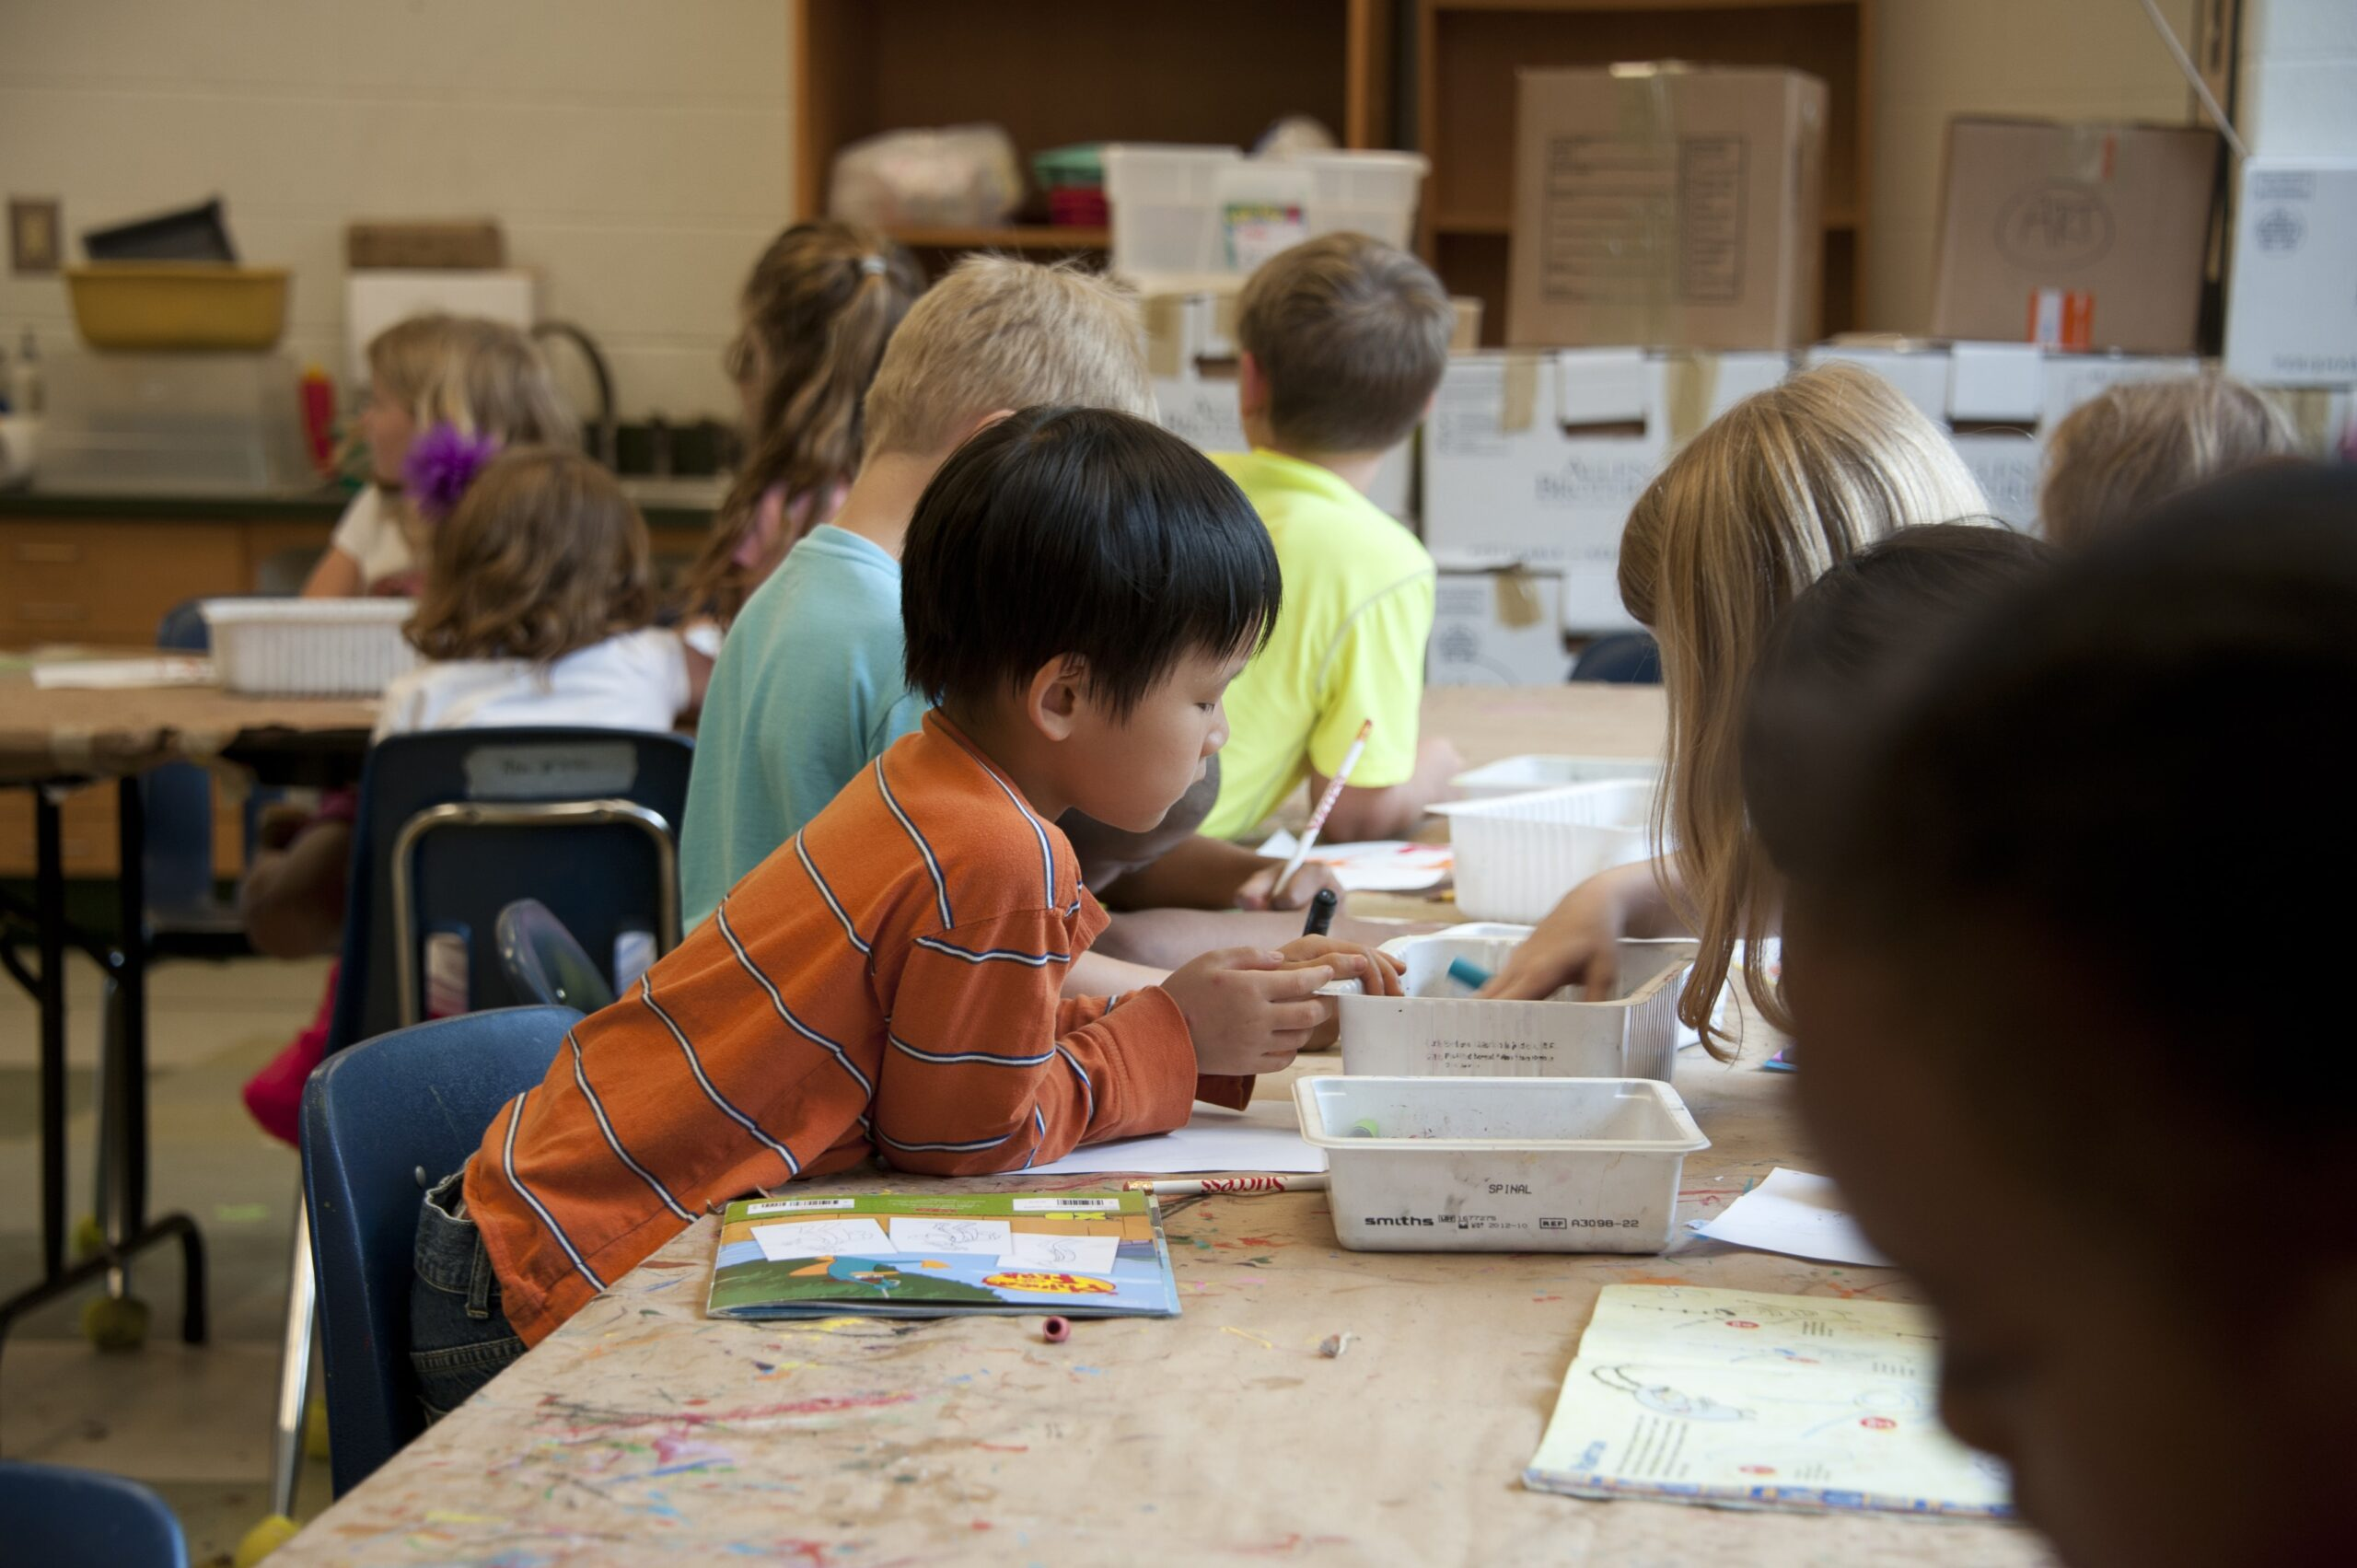 Private School - Children learning